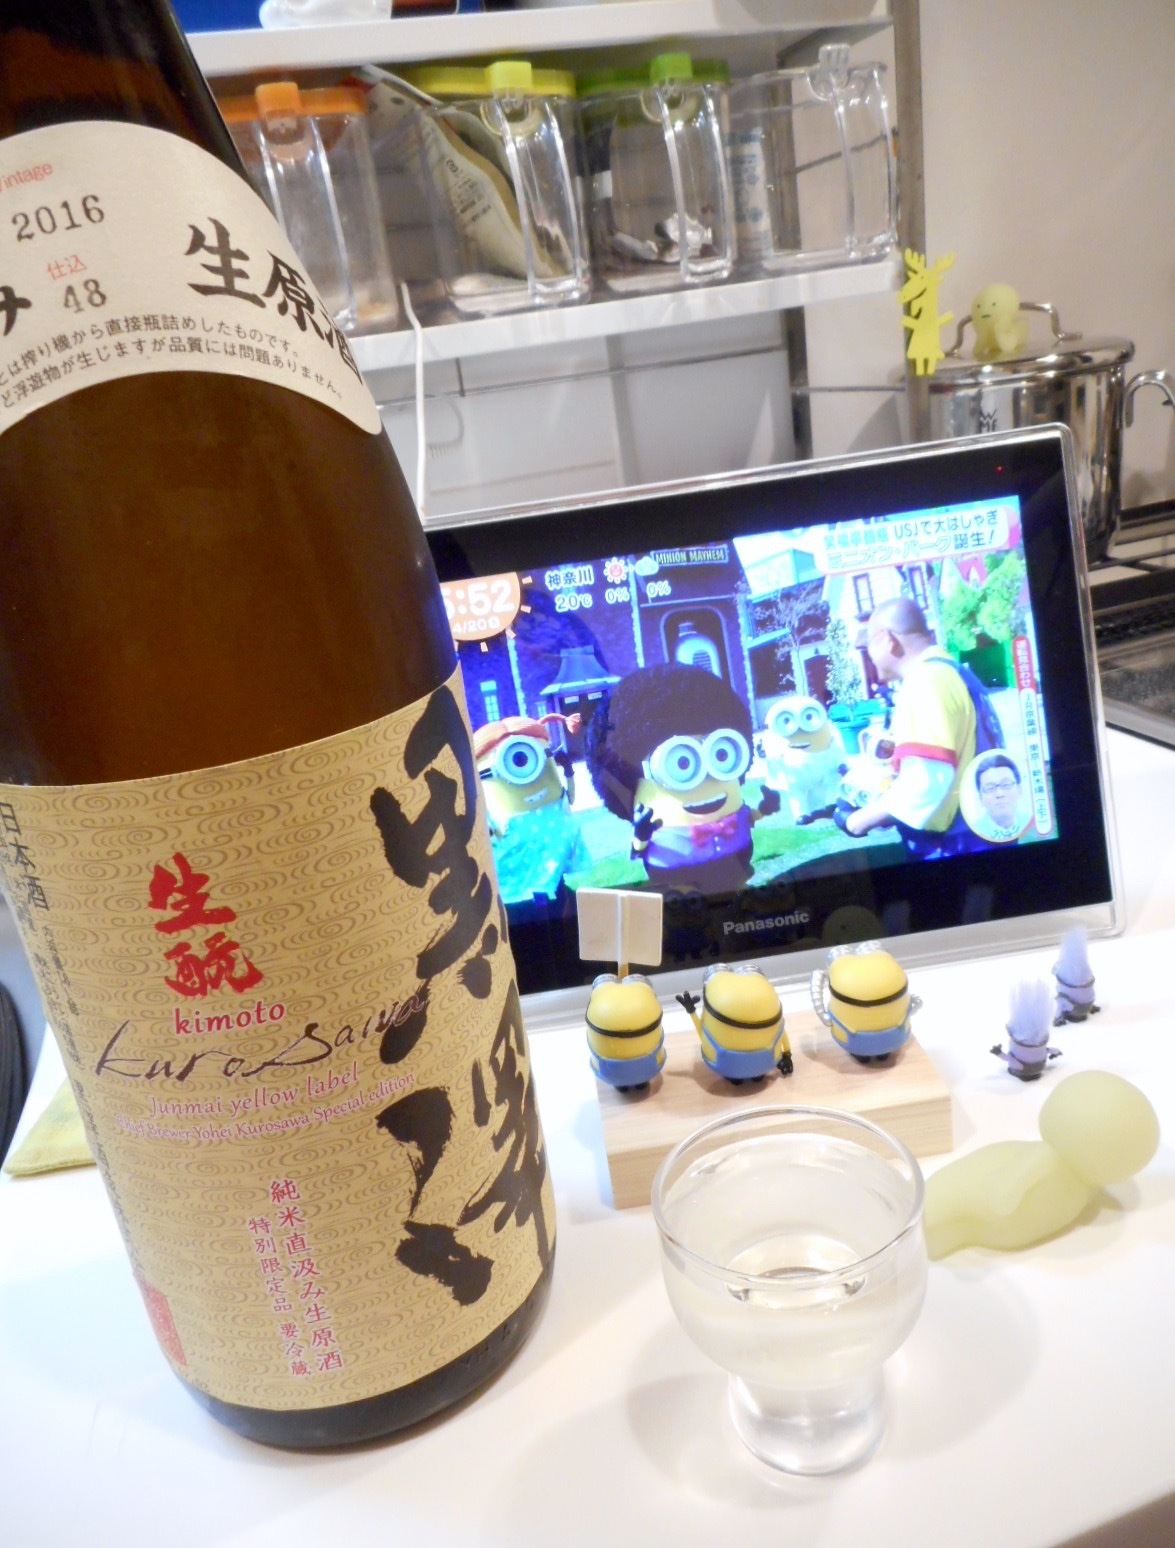 kurosawa_jikagumi_yellow28by5.jpg